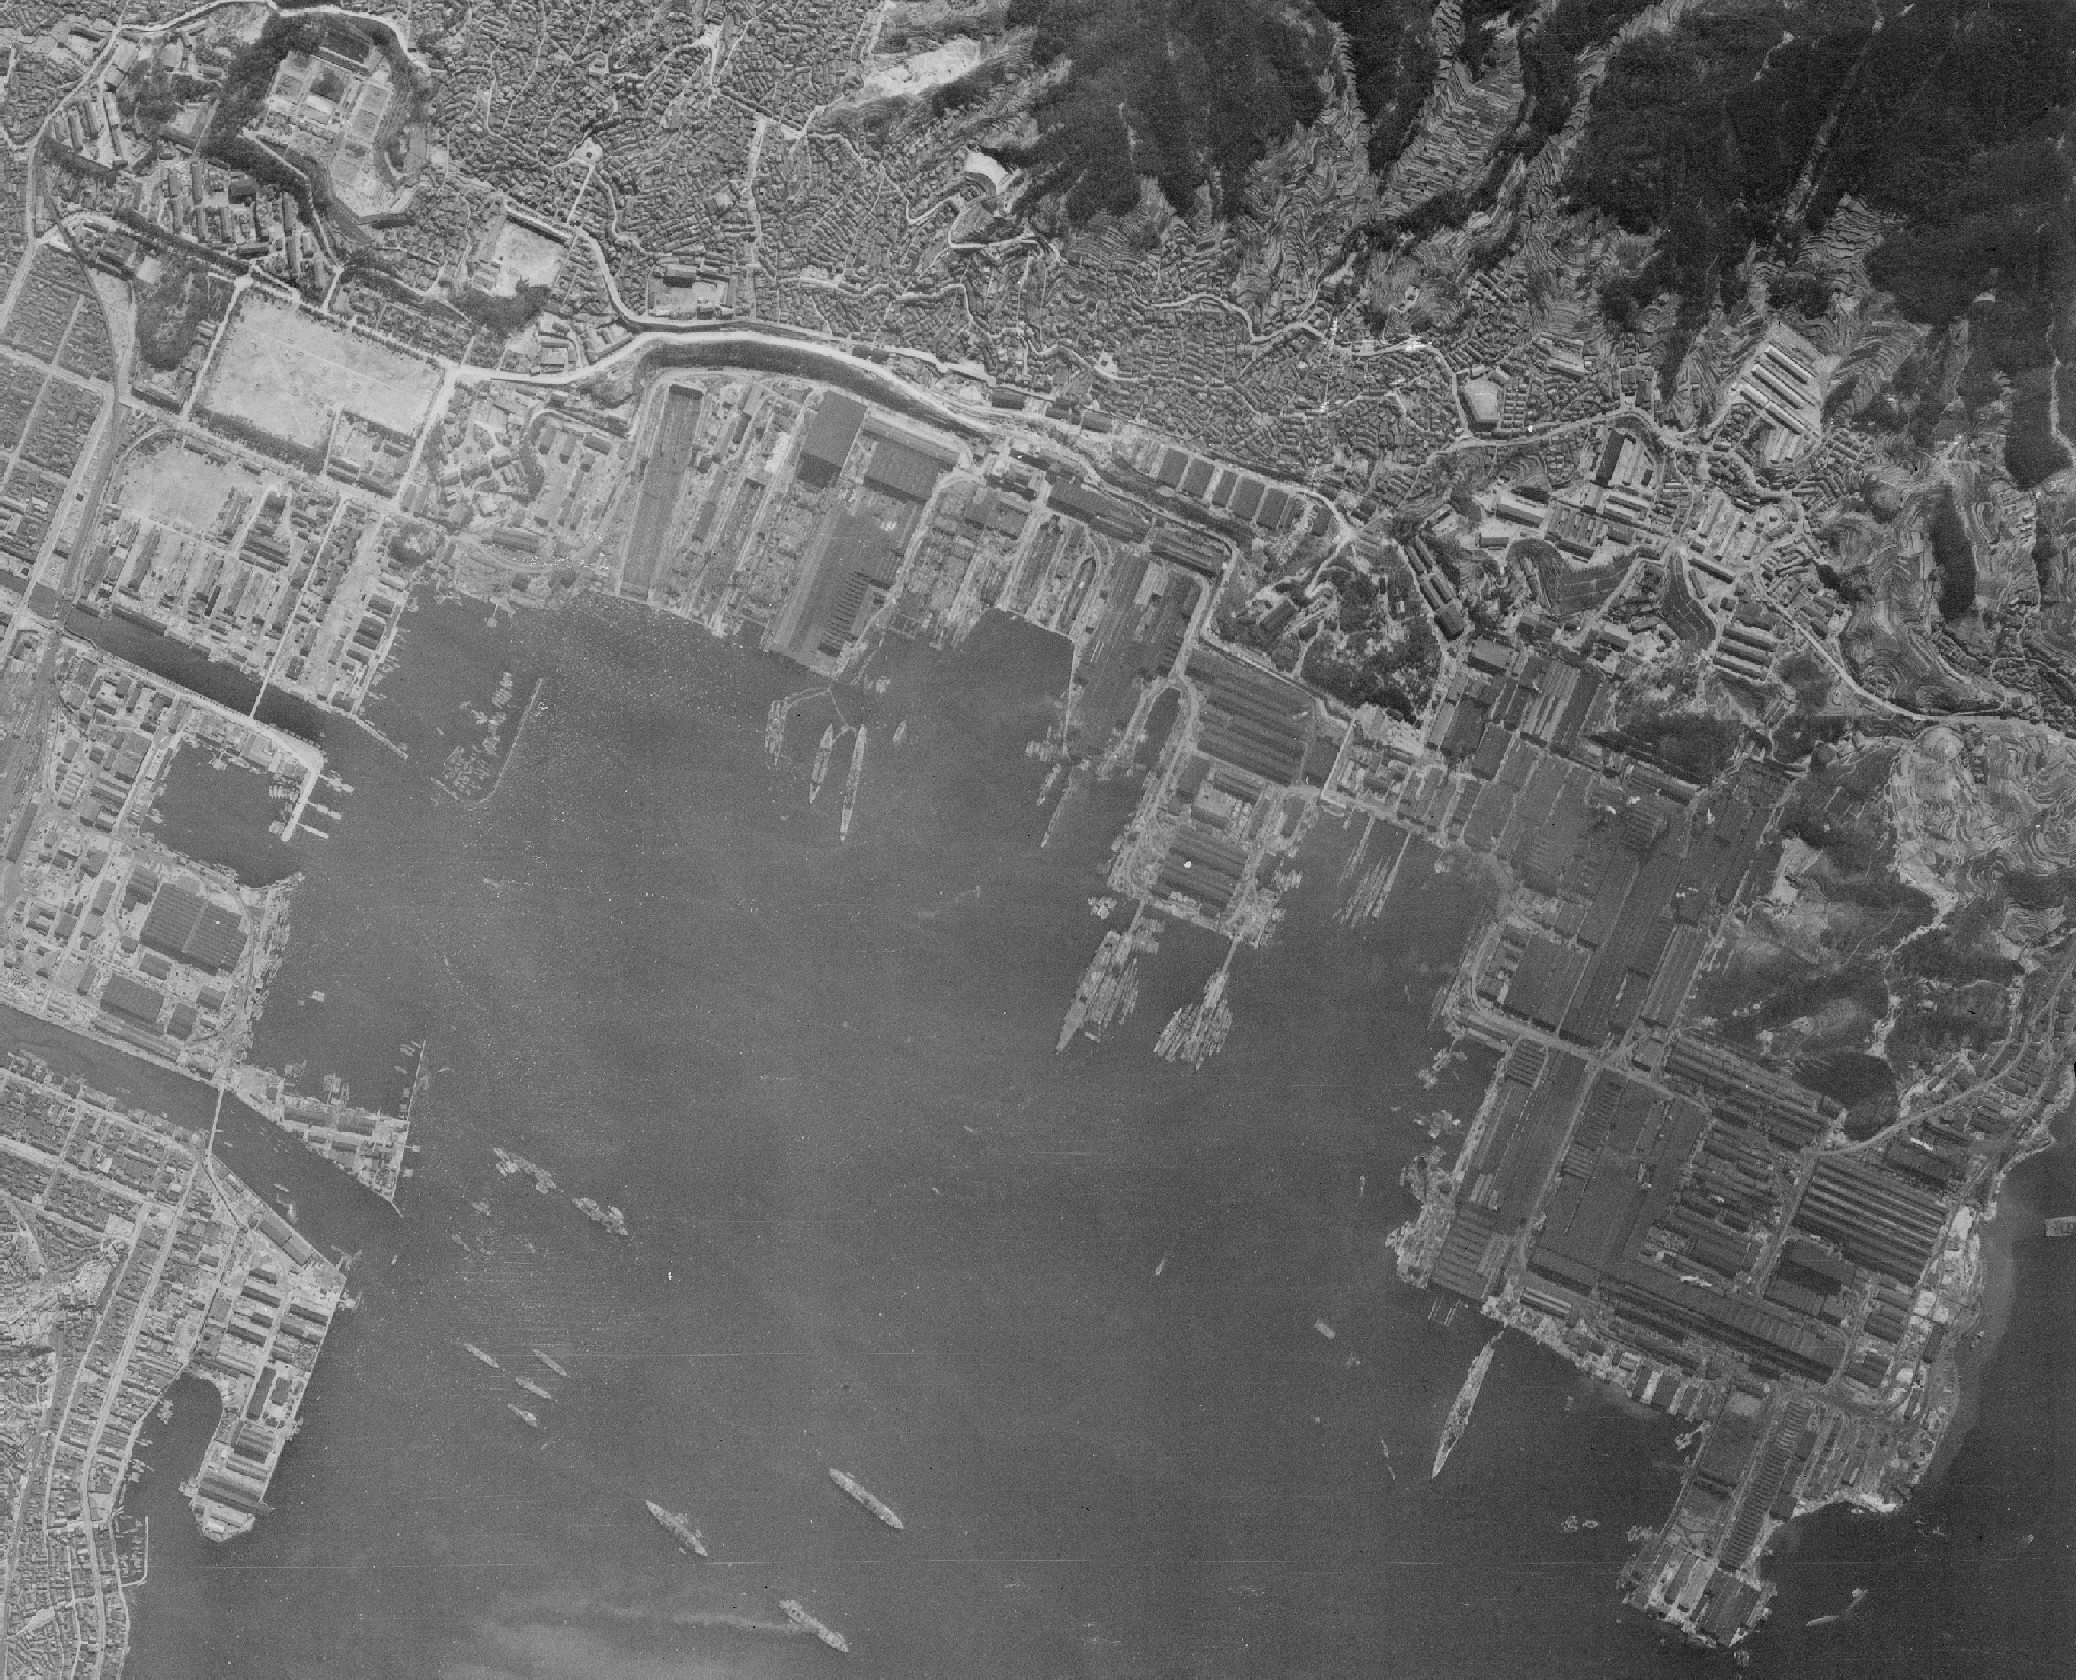 6.22呉海軍工廠の空襲